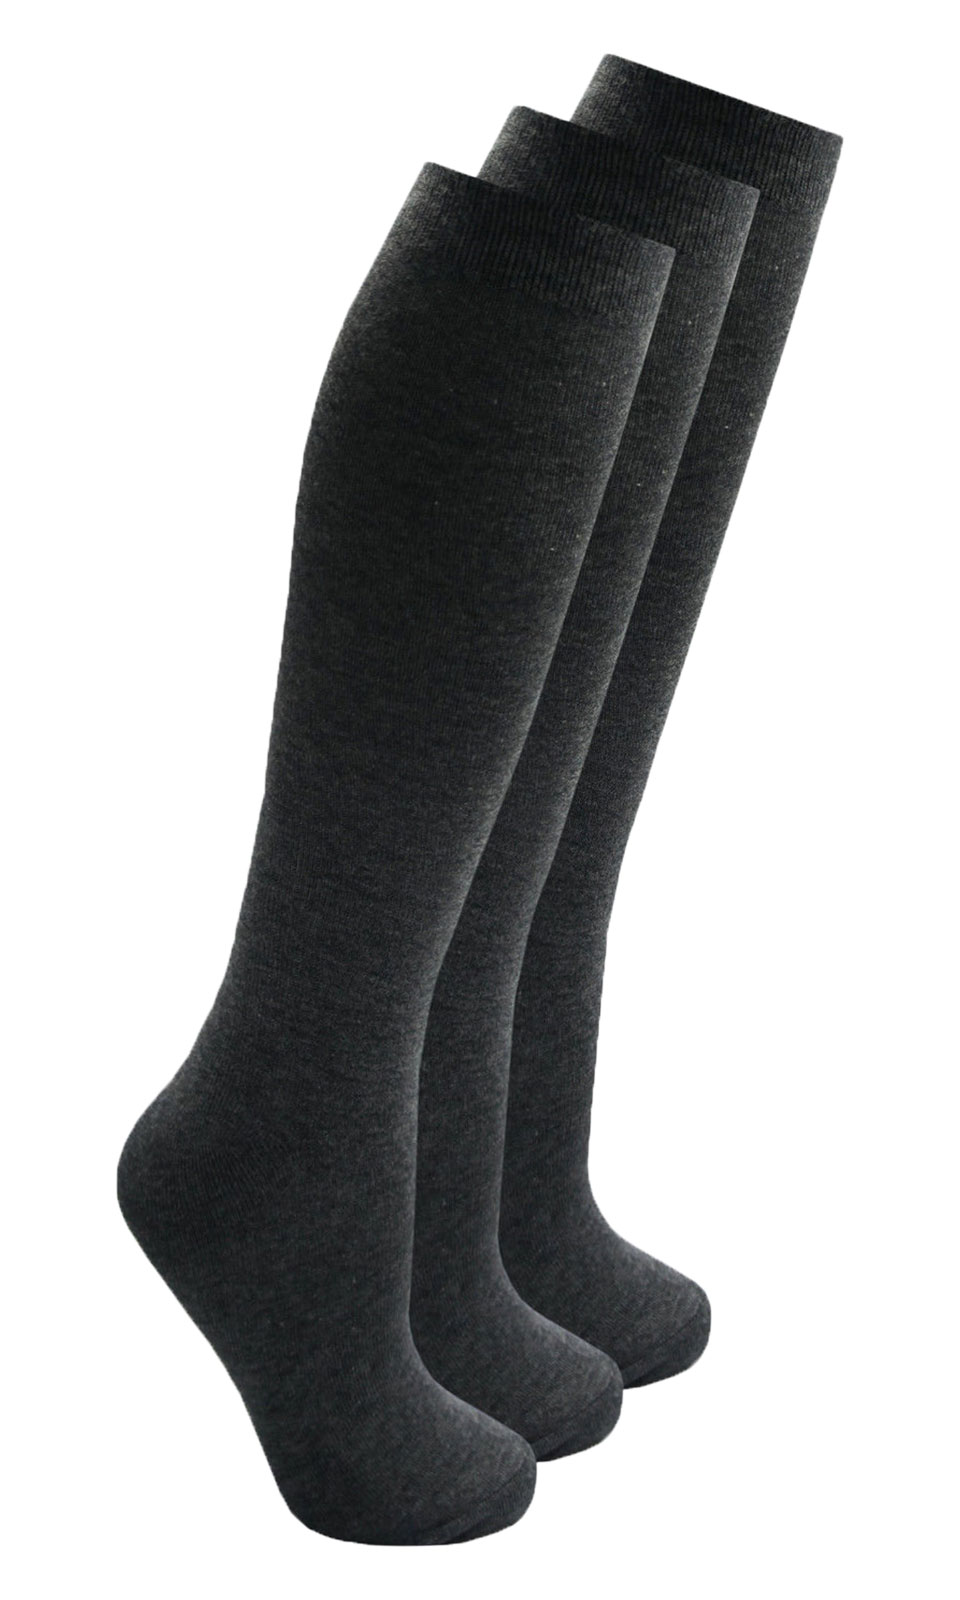 3 Pair Multi Pack Boys /& Girls Unisex Black Soft Cotton Rich School Socks